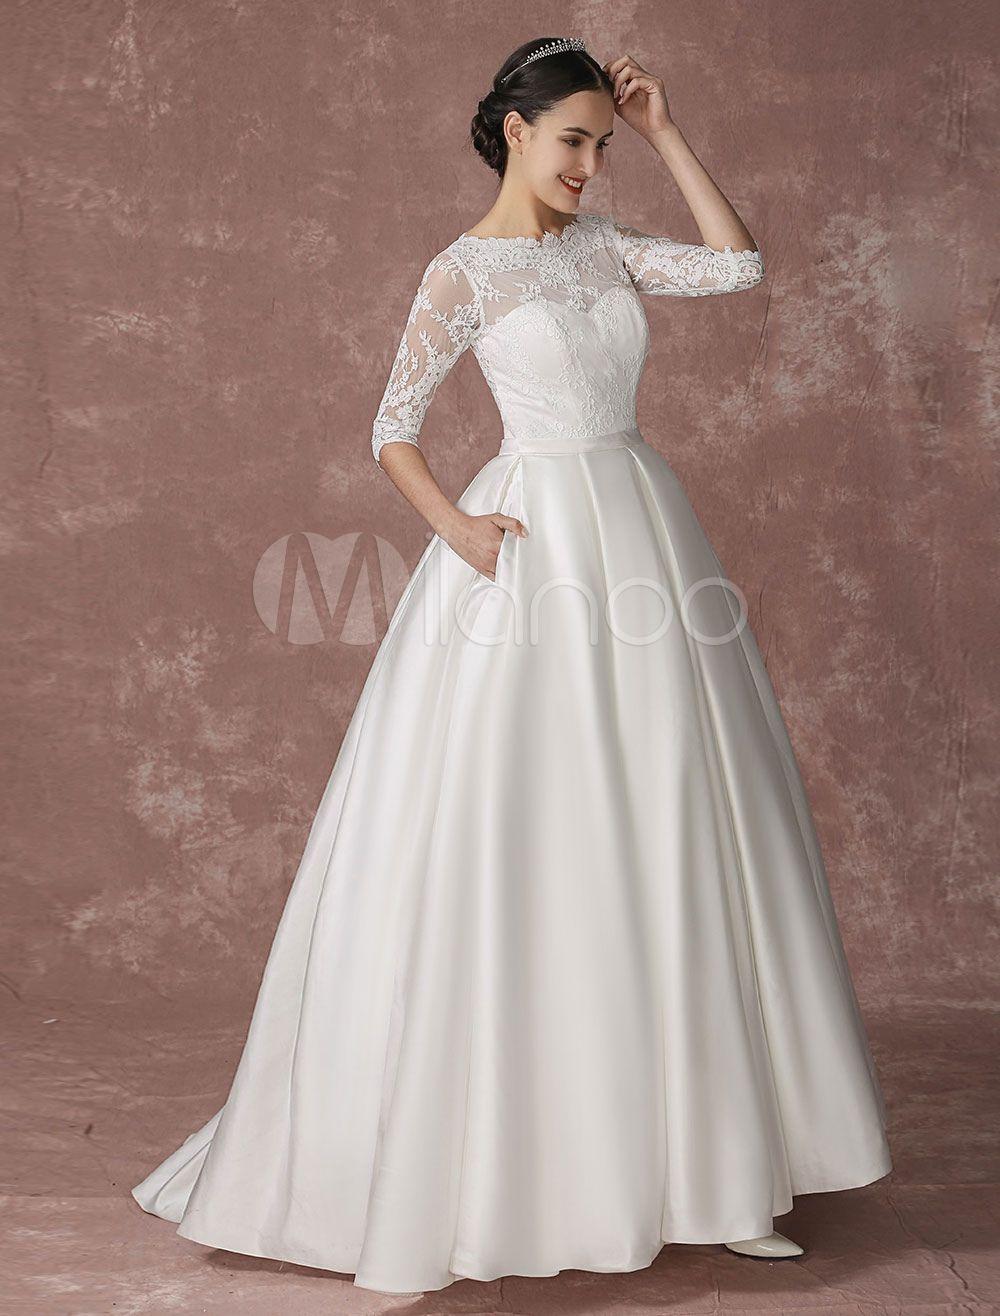 Satin Princess Wedding Dress Lace Ball Gown Bridal Dress Half ...